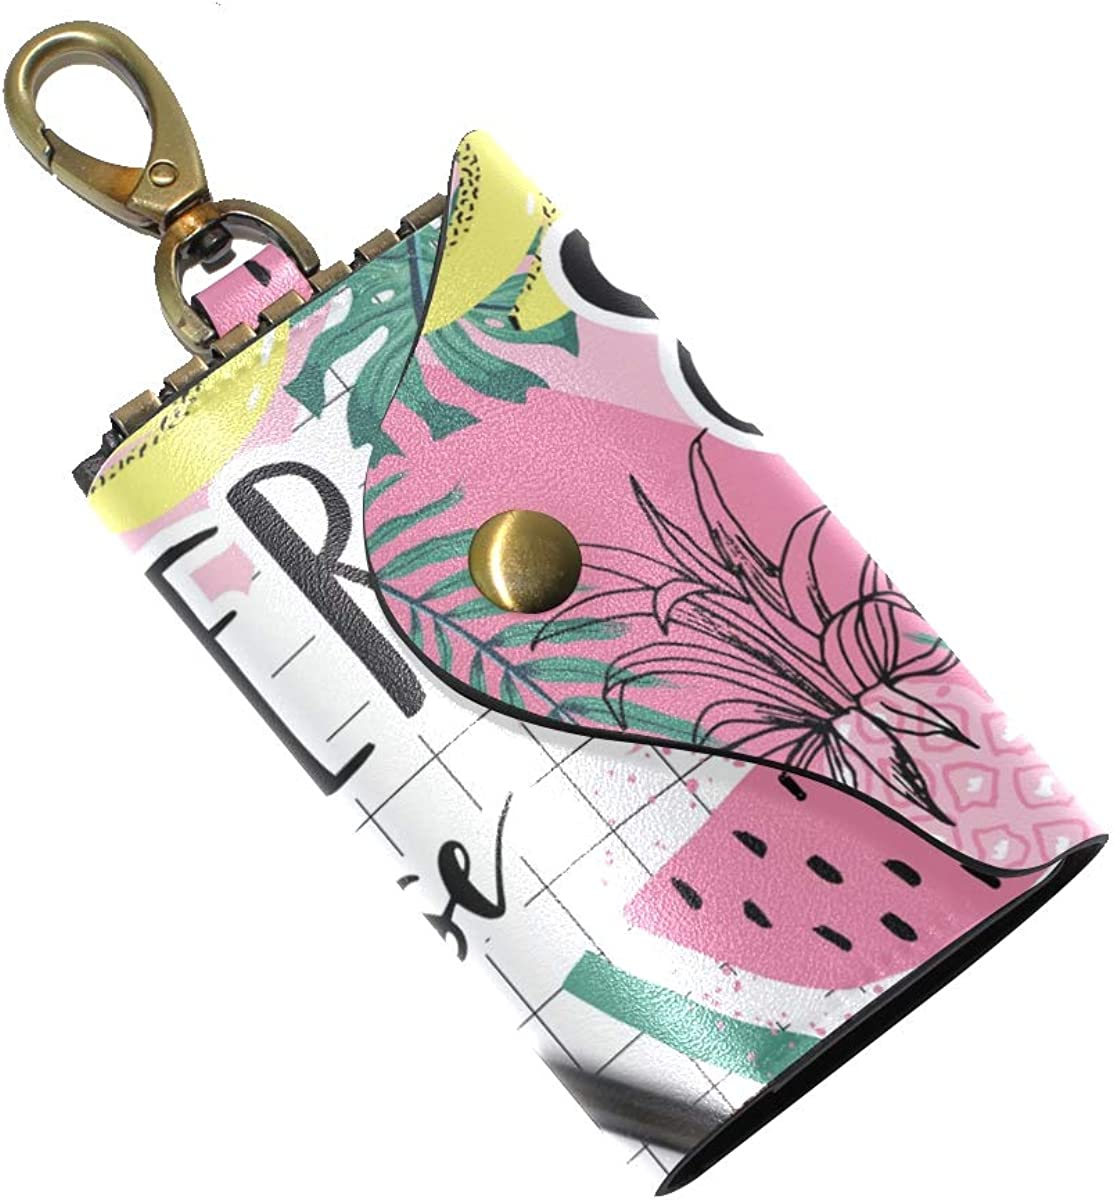 KEAKIA Summer Paradise Leather Key Case Wallets Tri-fold Key Holder Keychains with 6 Hooks 2 Slot Snap Closure for Men Women